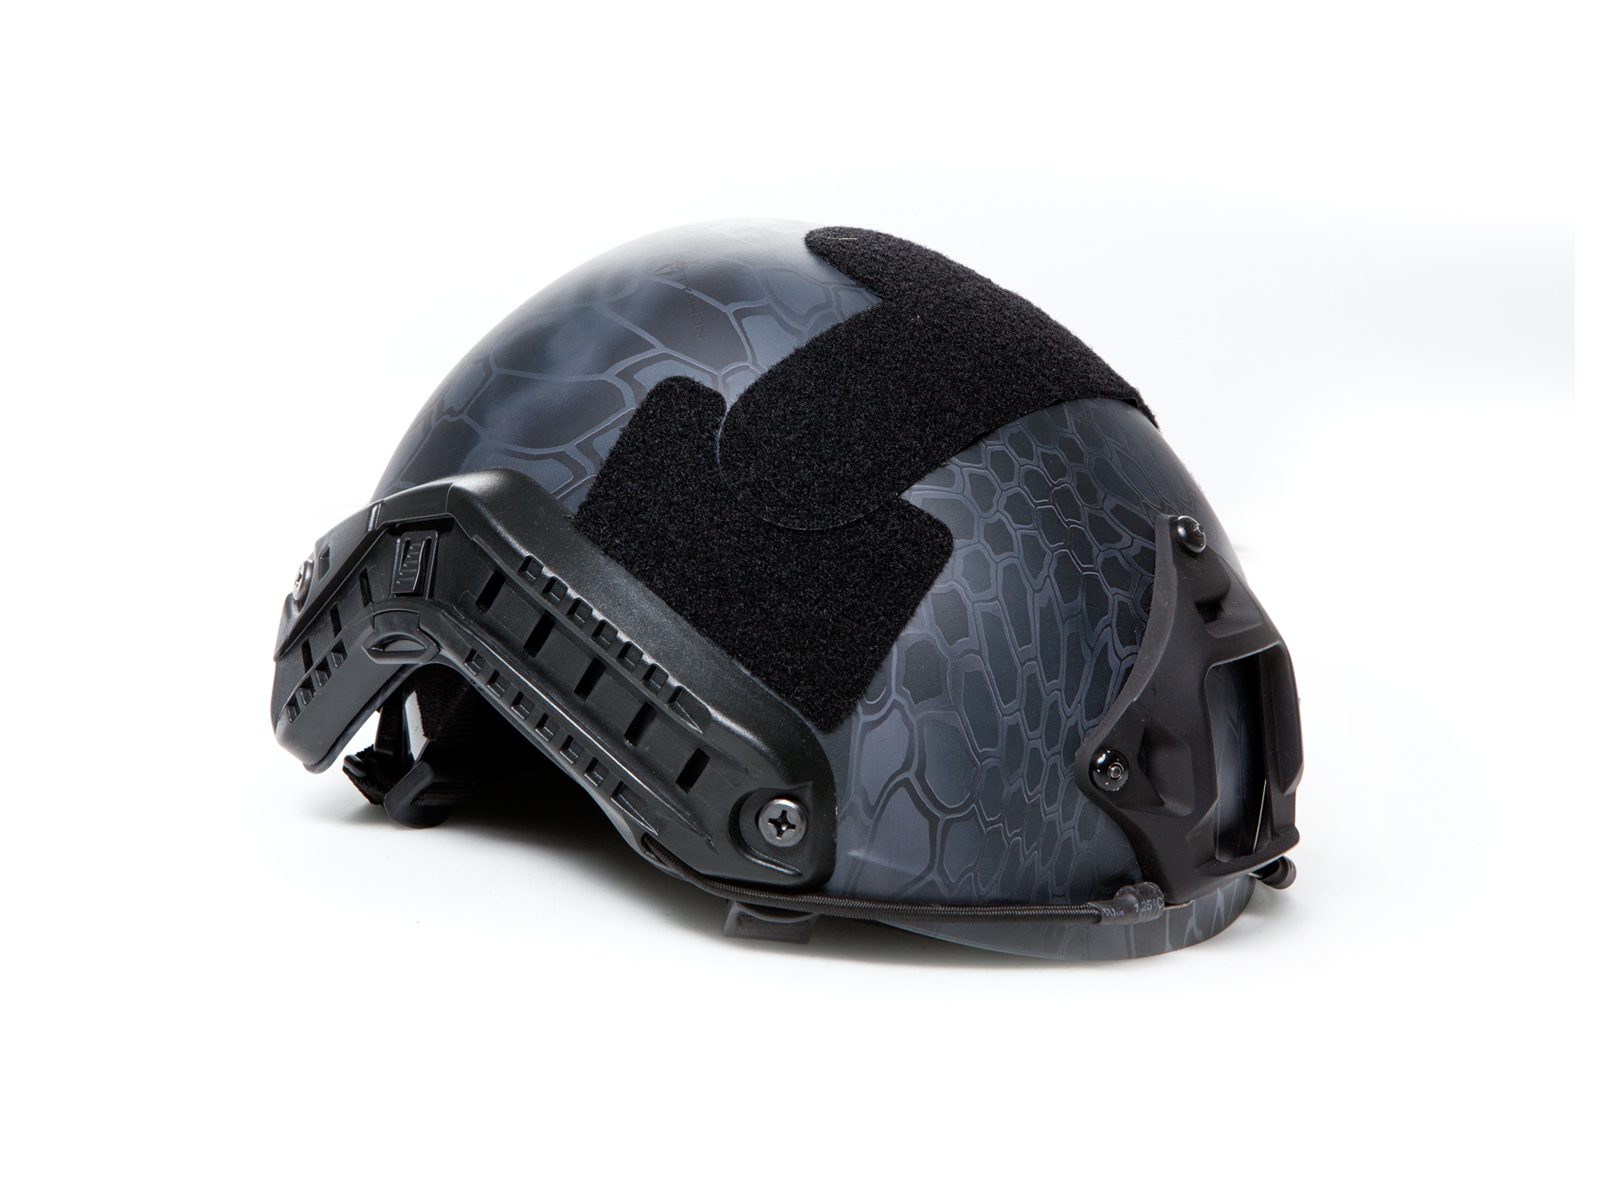 ASG Fast Helmet Typhon product image